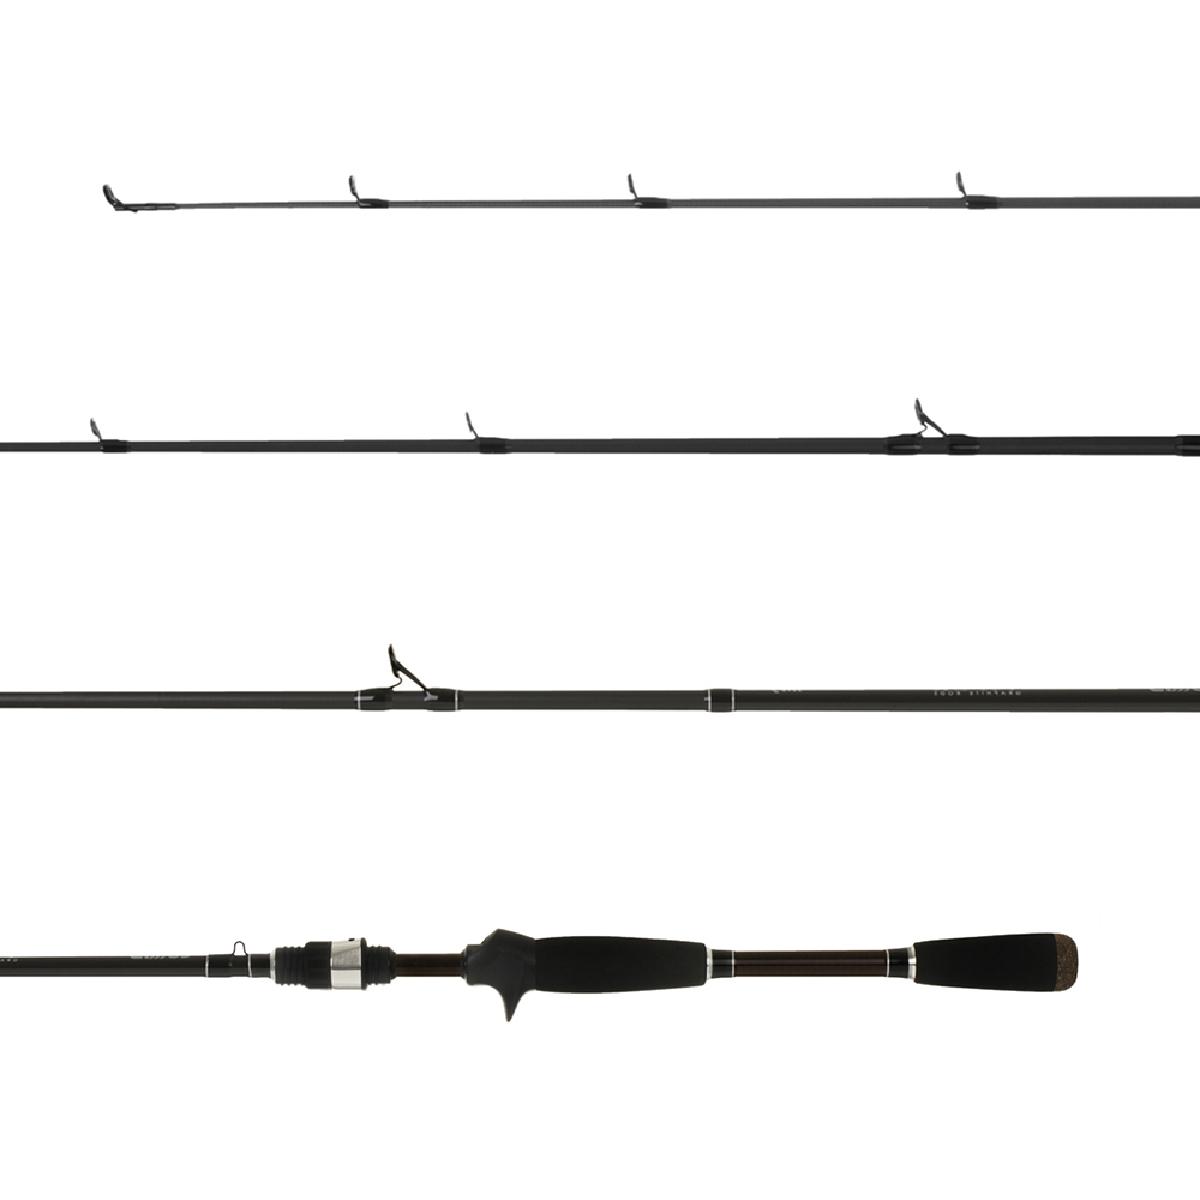 Vara Lumis Viper 702 (2,13m) 15-30lb Carretilha 2 Partes  - Pesca Adventure